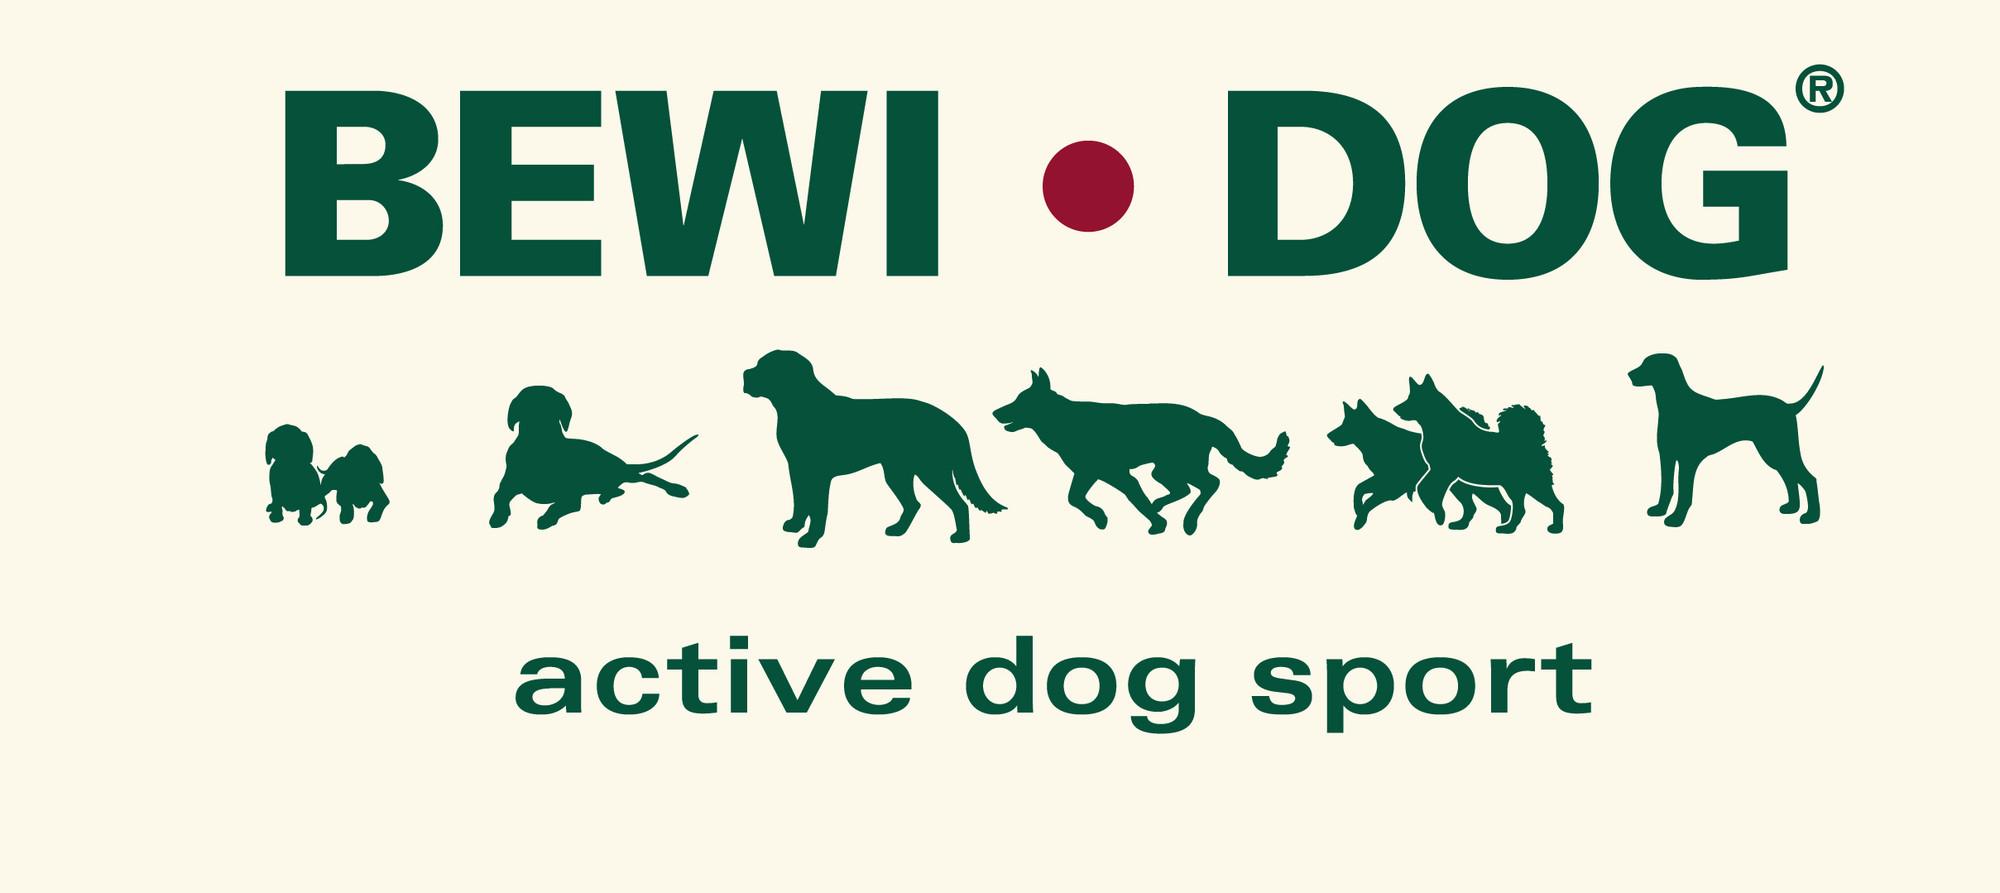 BEWI DOOG® Startnummern-Sätze